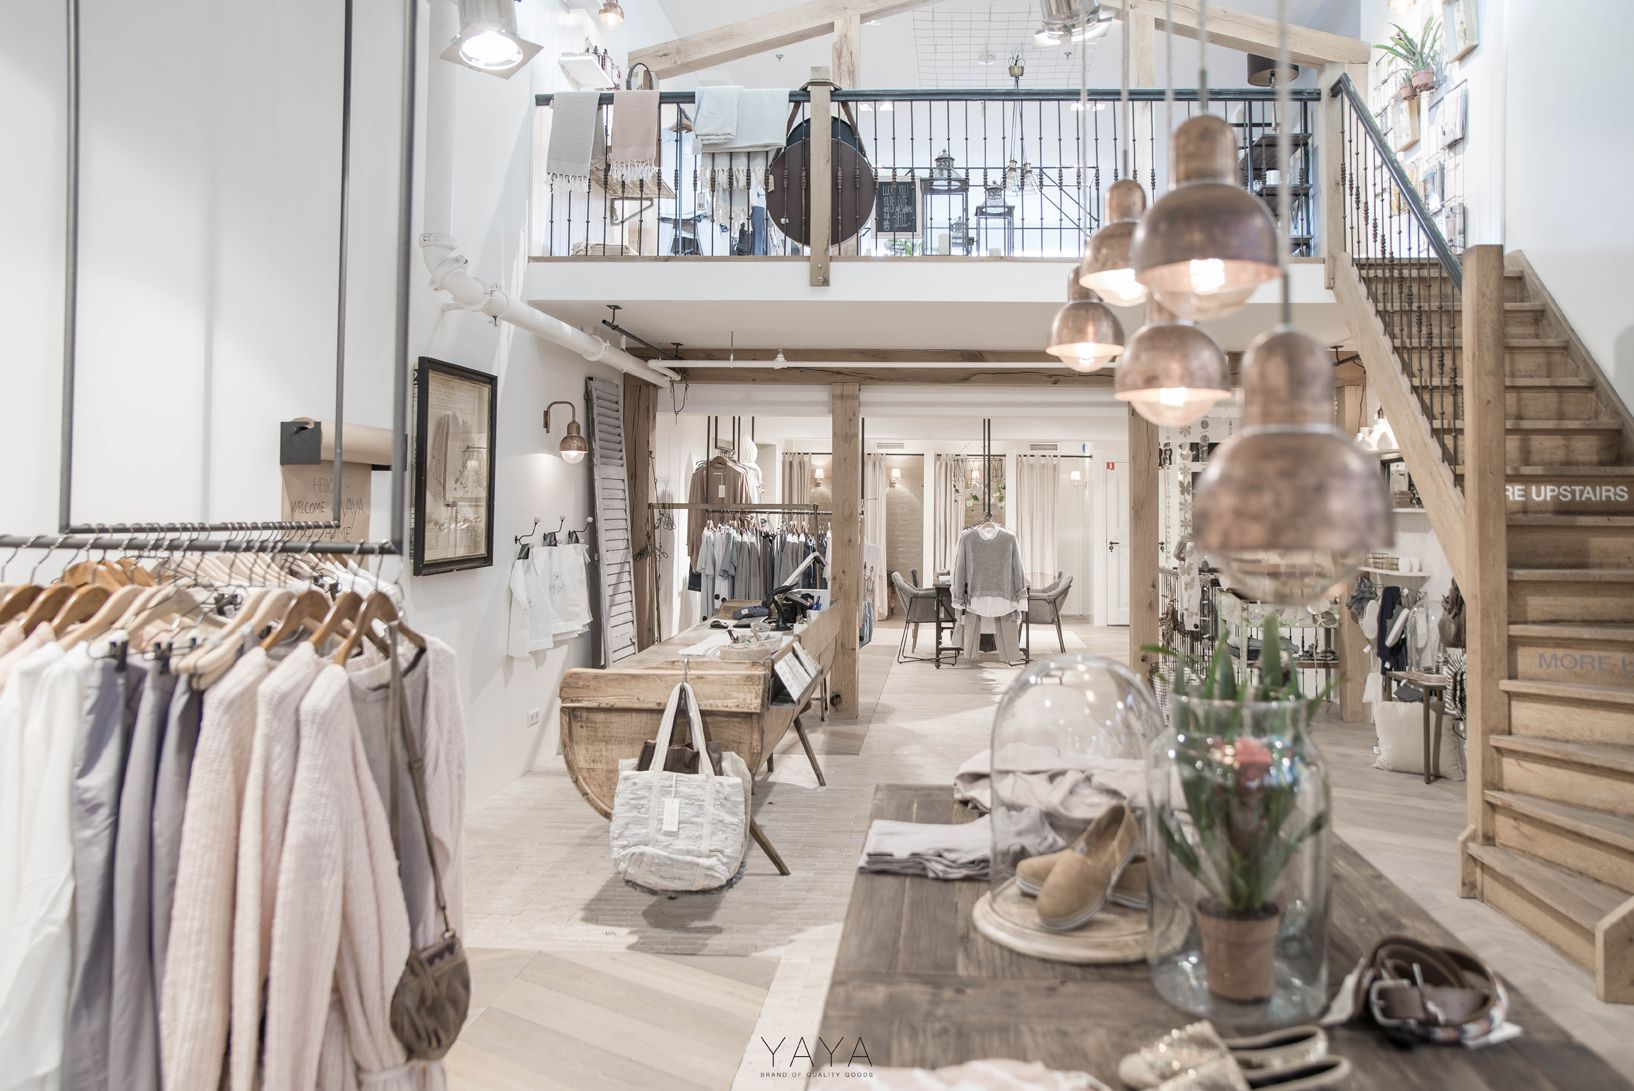 yaya concept store amstelveen photography paulina arcklin